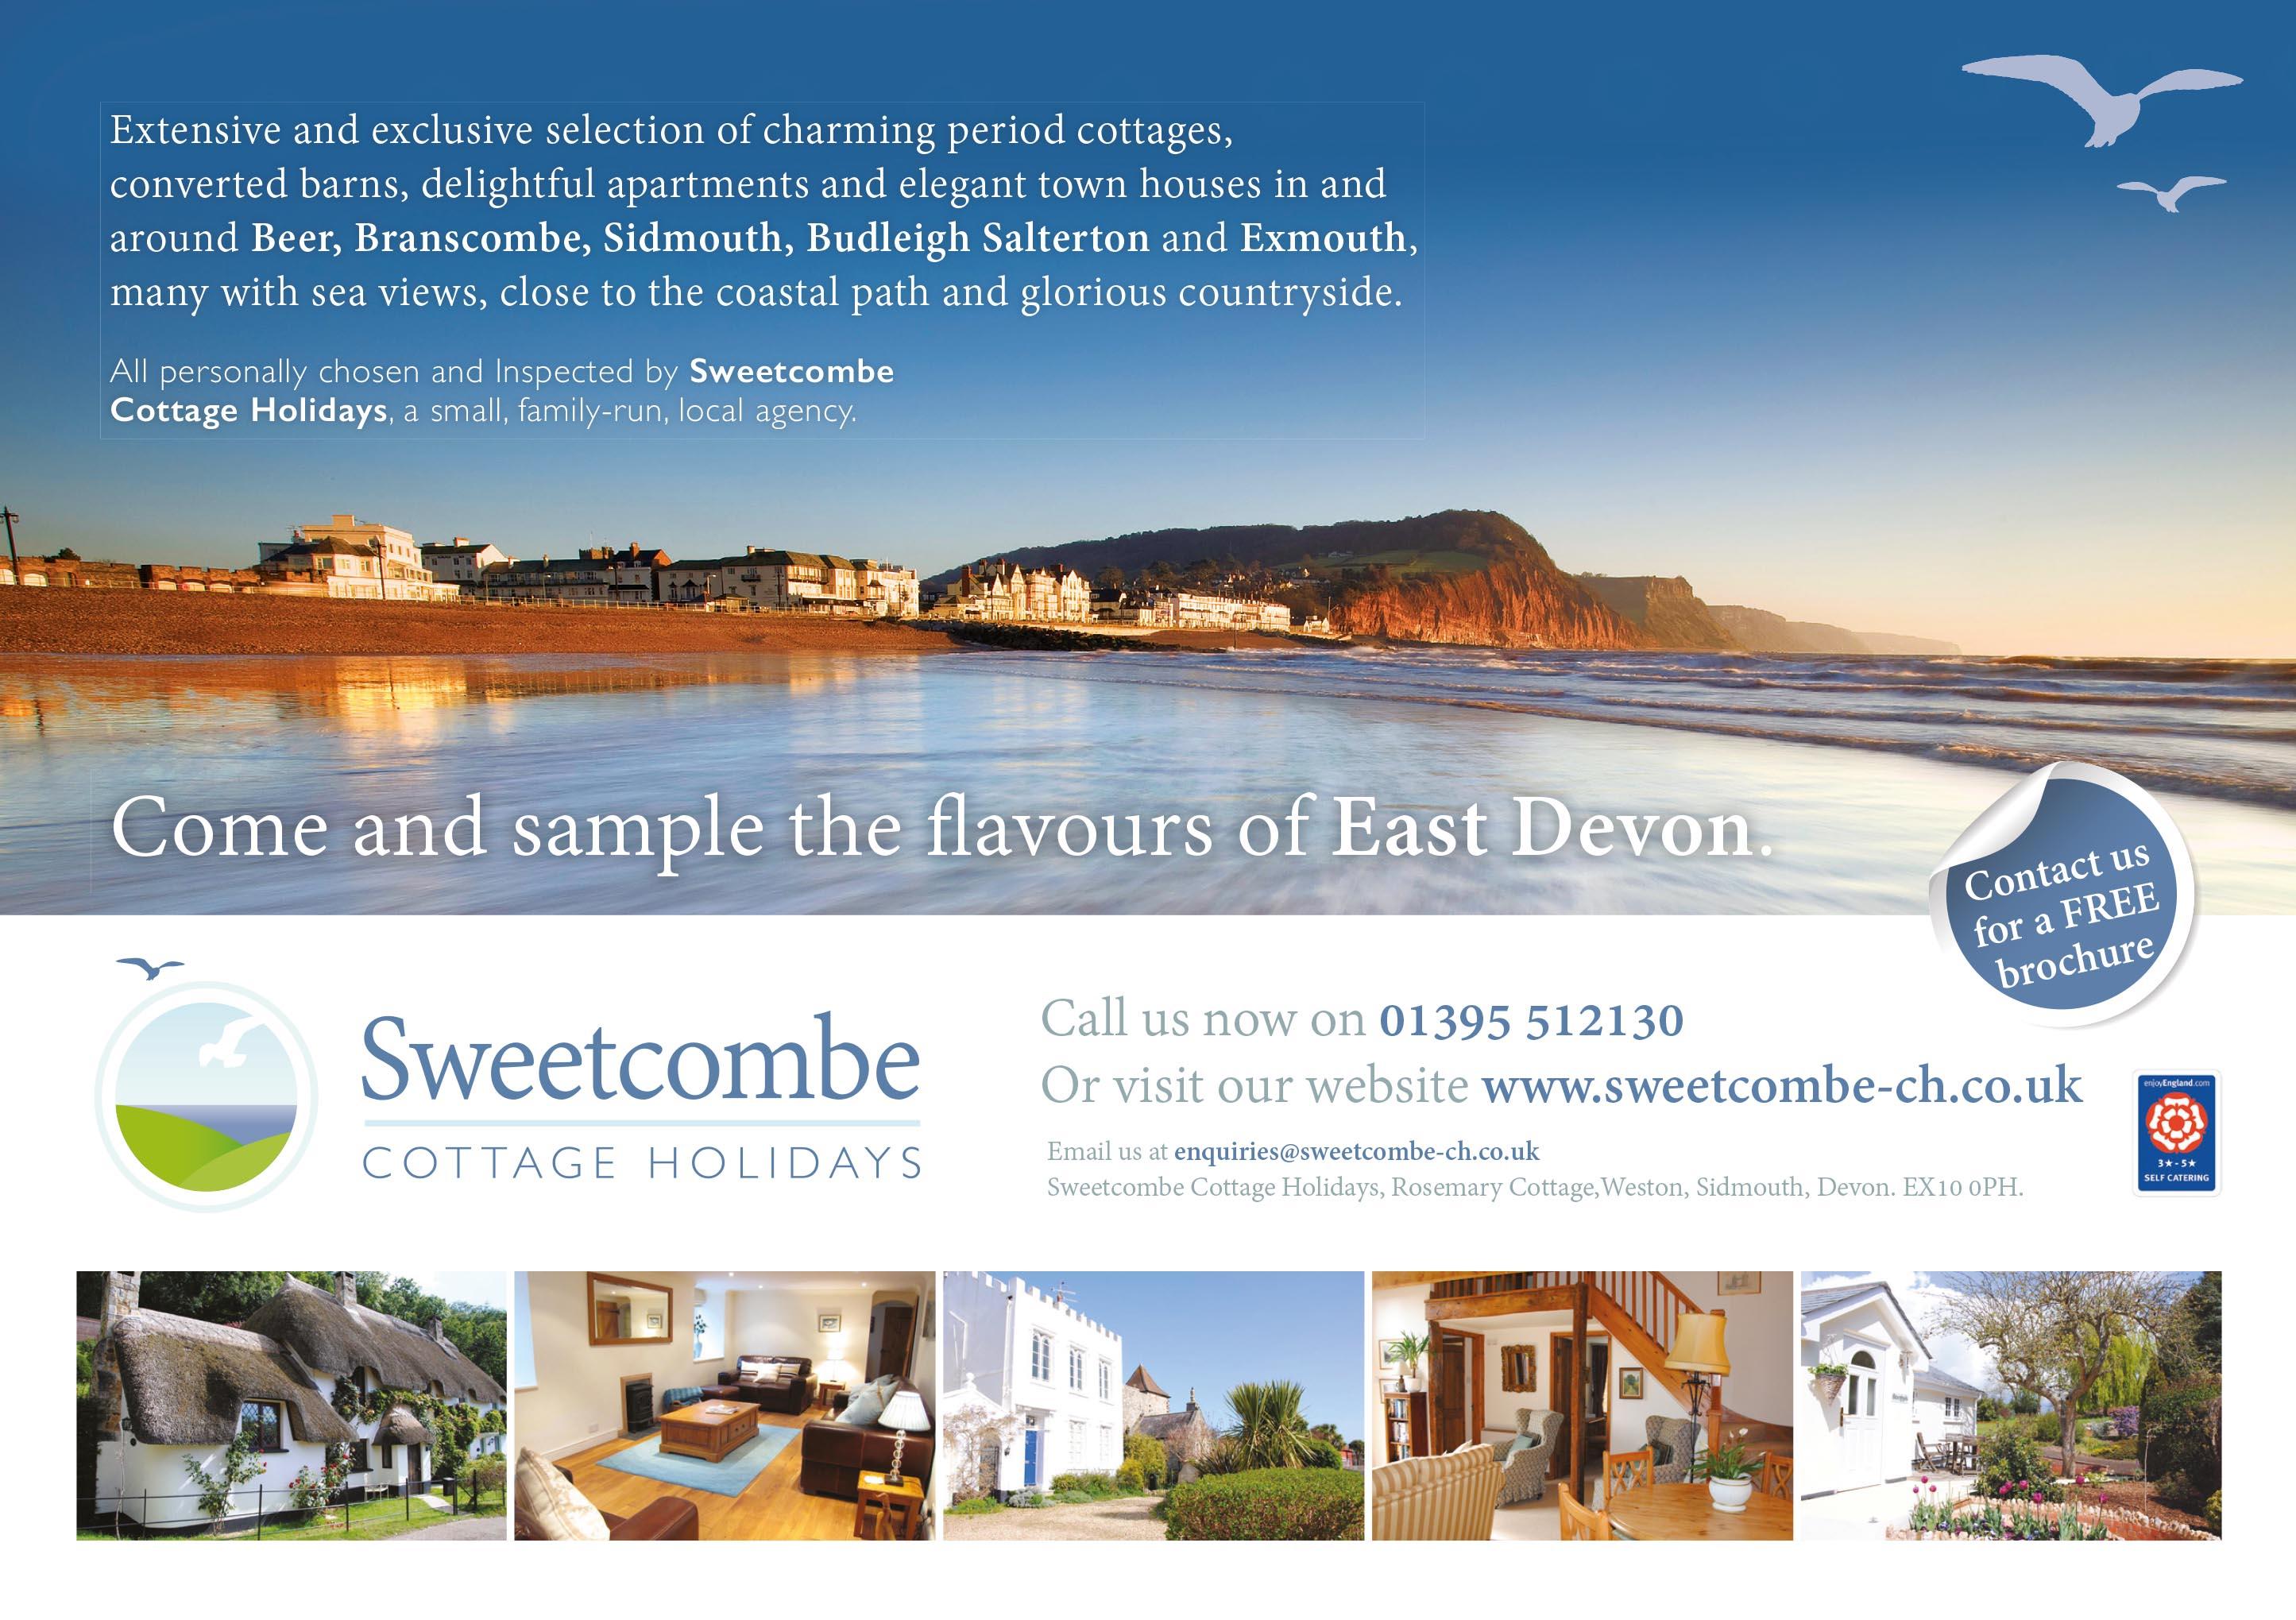 Sweetcombe Cottage Holidays